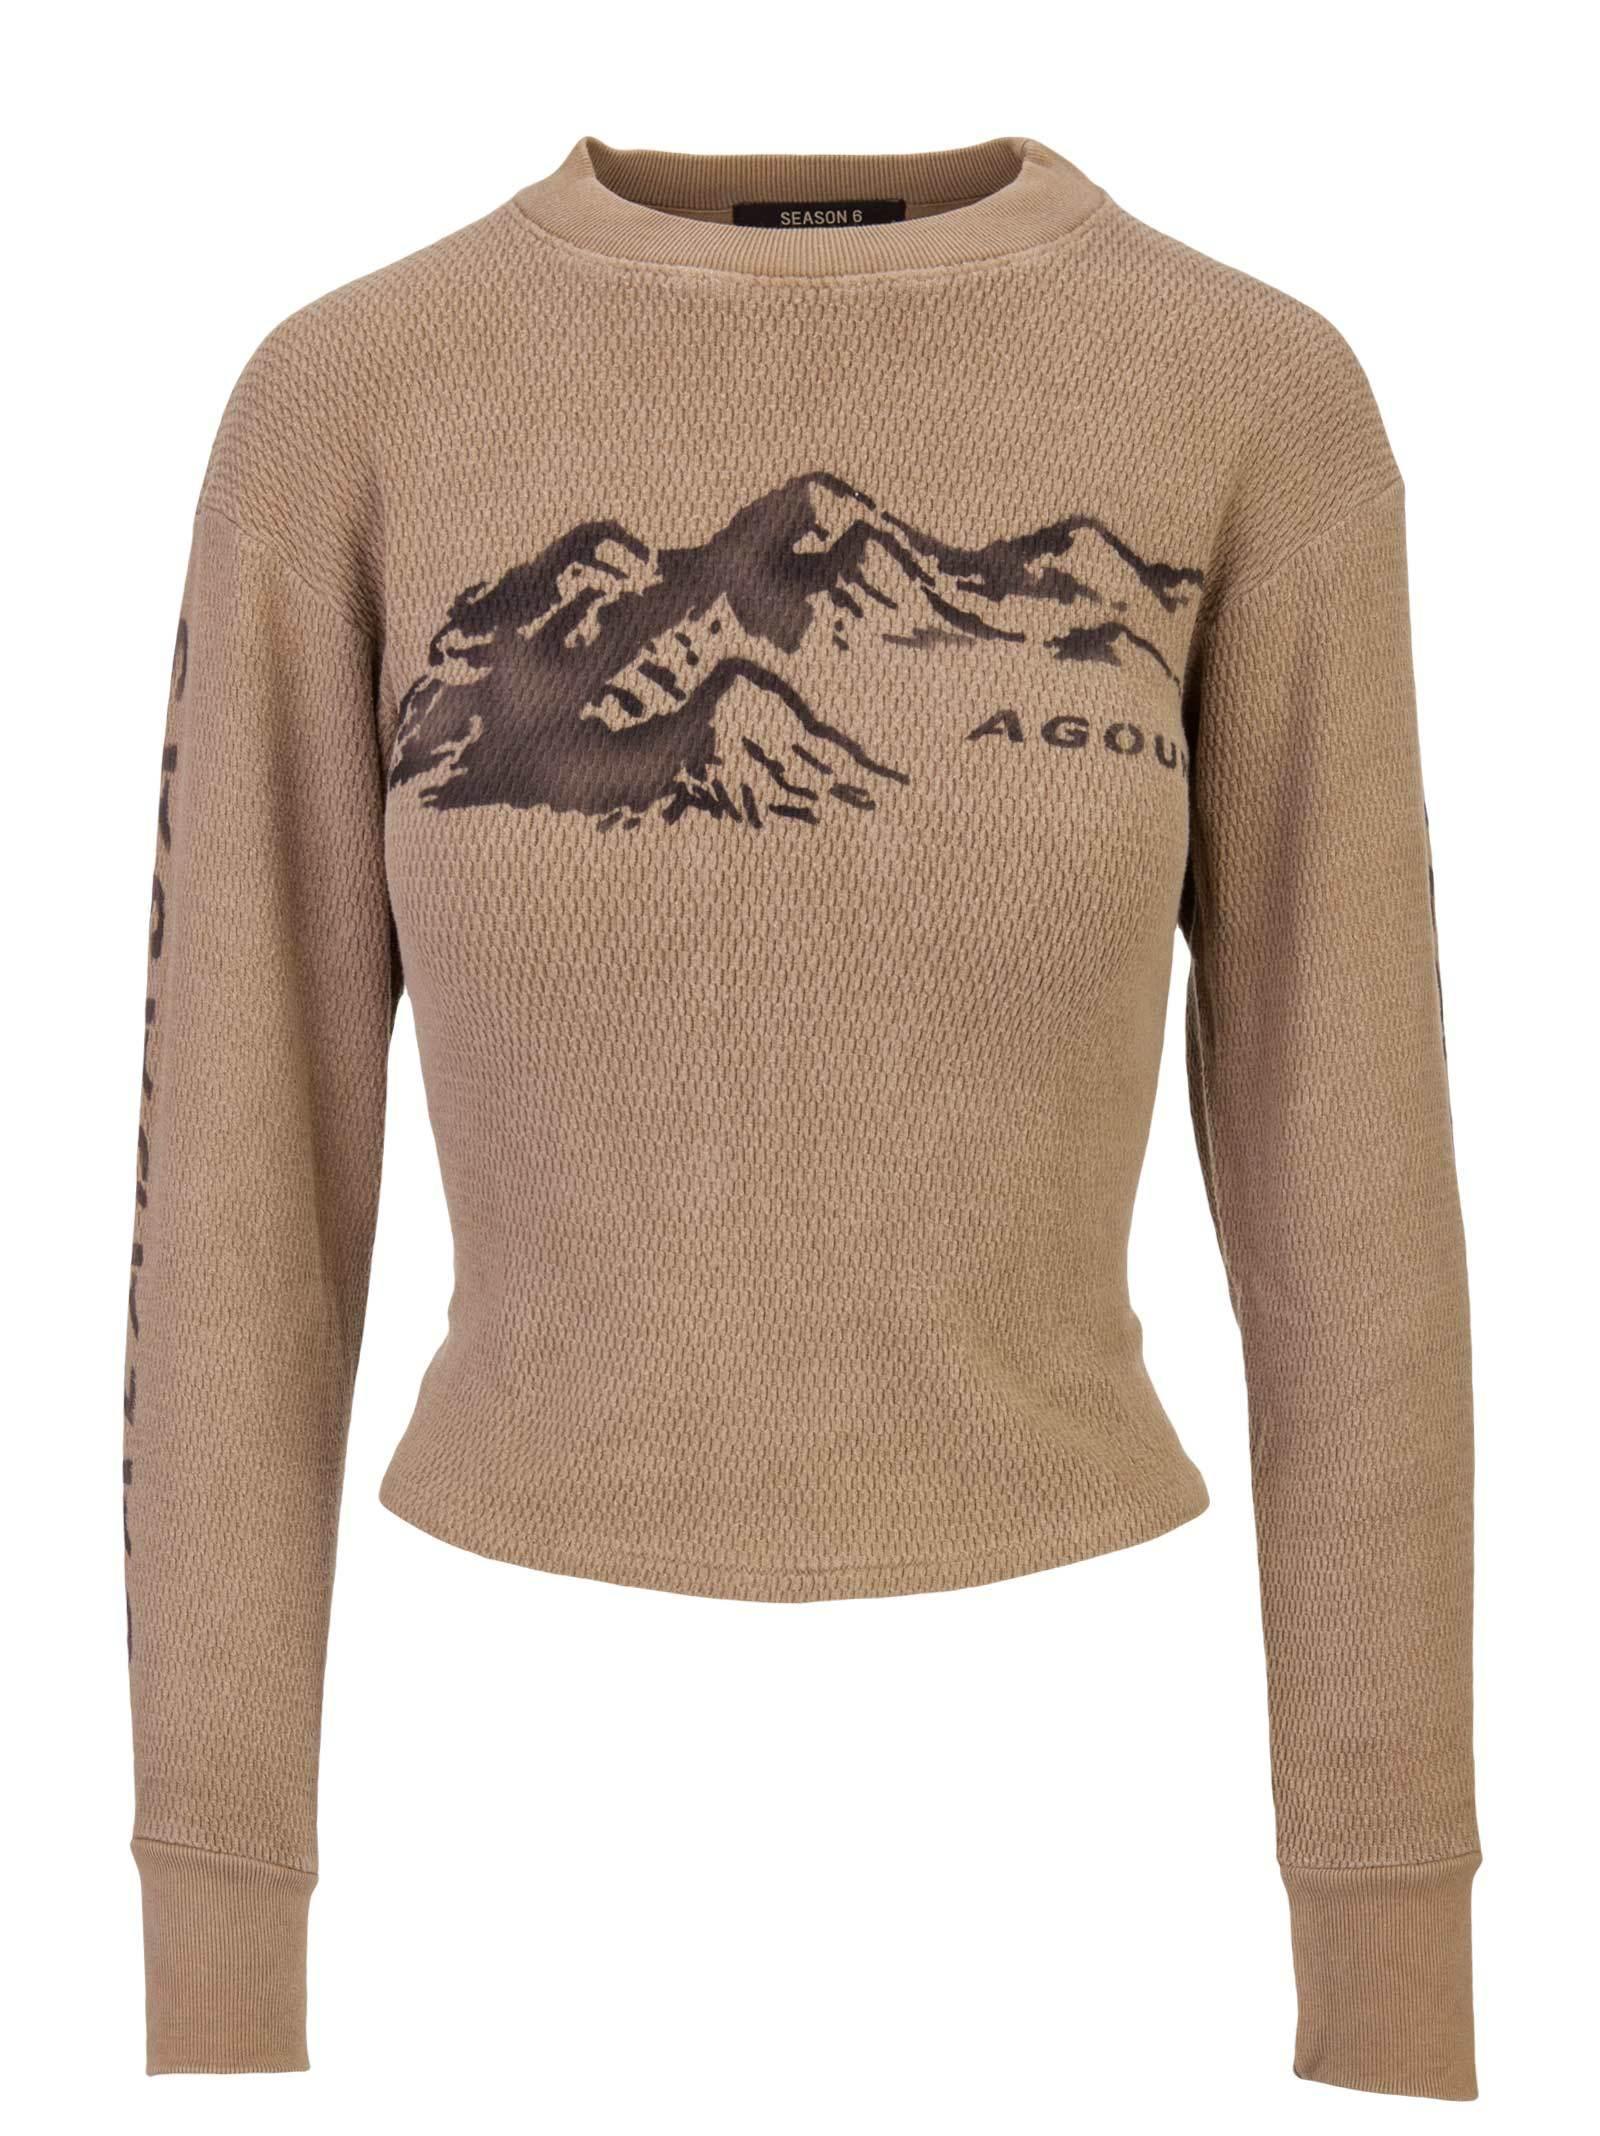 3c8e4822 Yeezy Season 6 Thermal Sweater In Brown | ModeSens